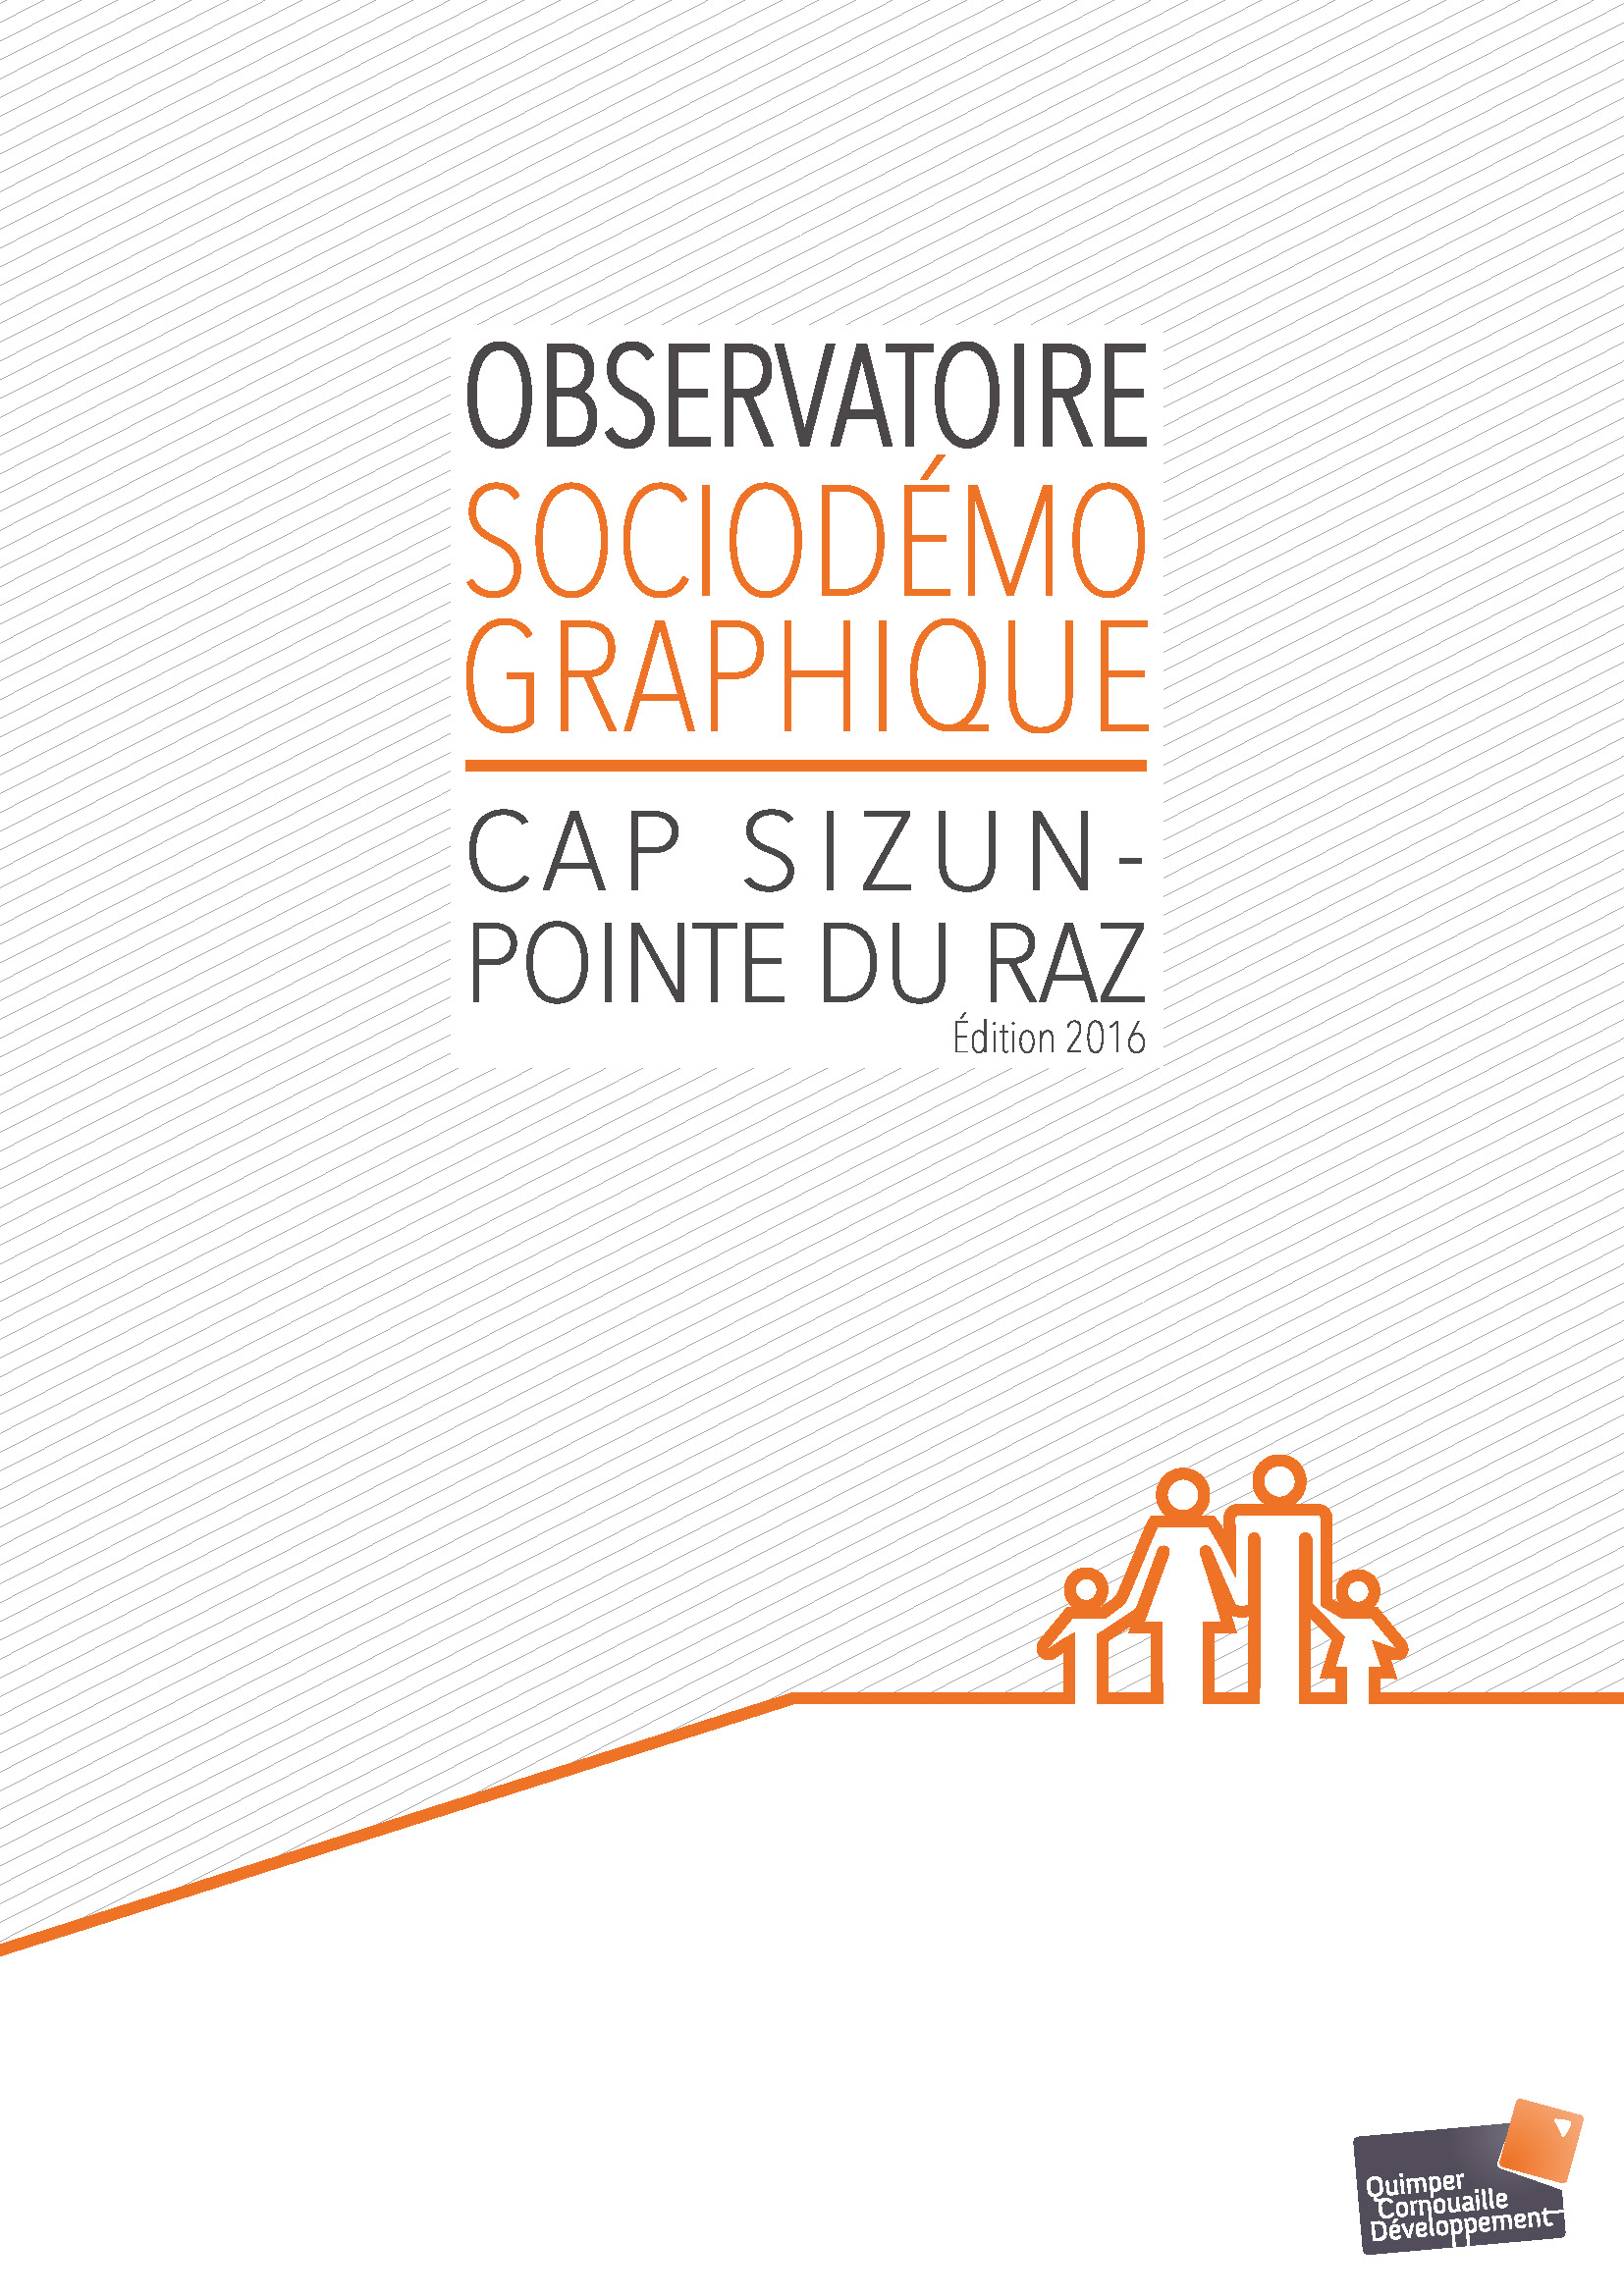 Observatoire socio-démographique Cap Sizun-Pointe du Raz. Edition 2016 (11/2017)